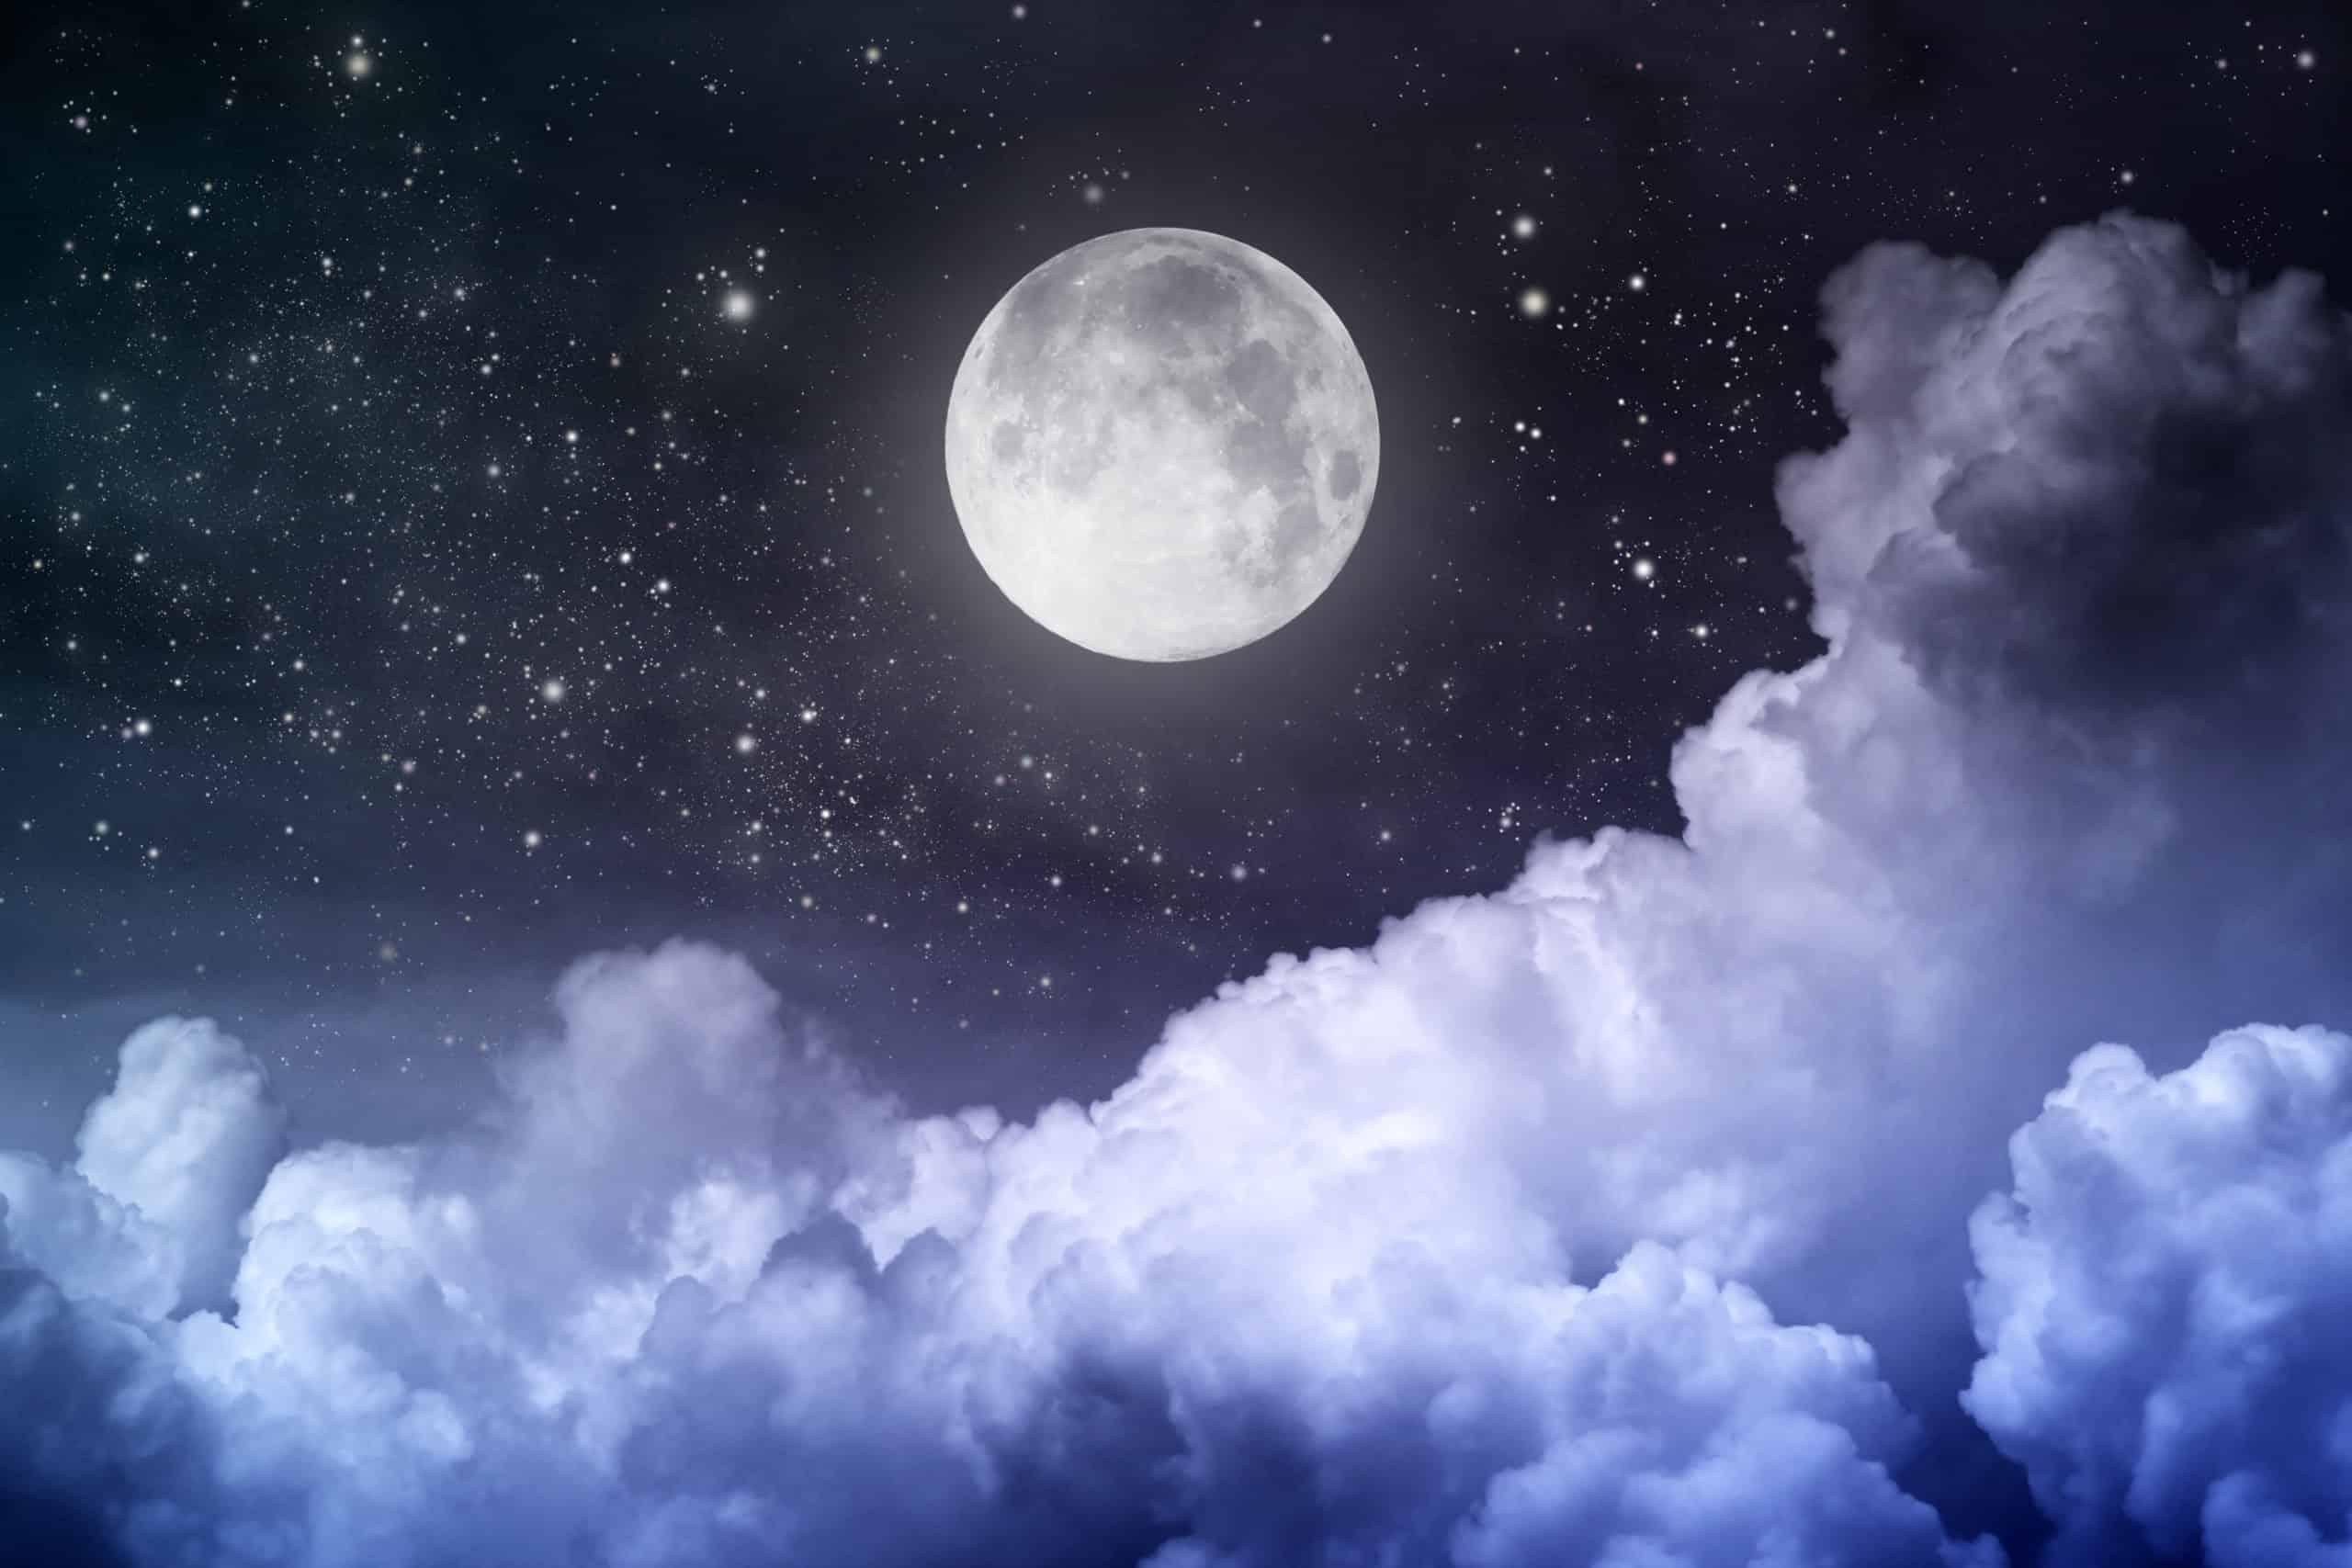 лунный календарь покупок на апрель 2020 таблица